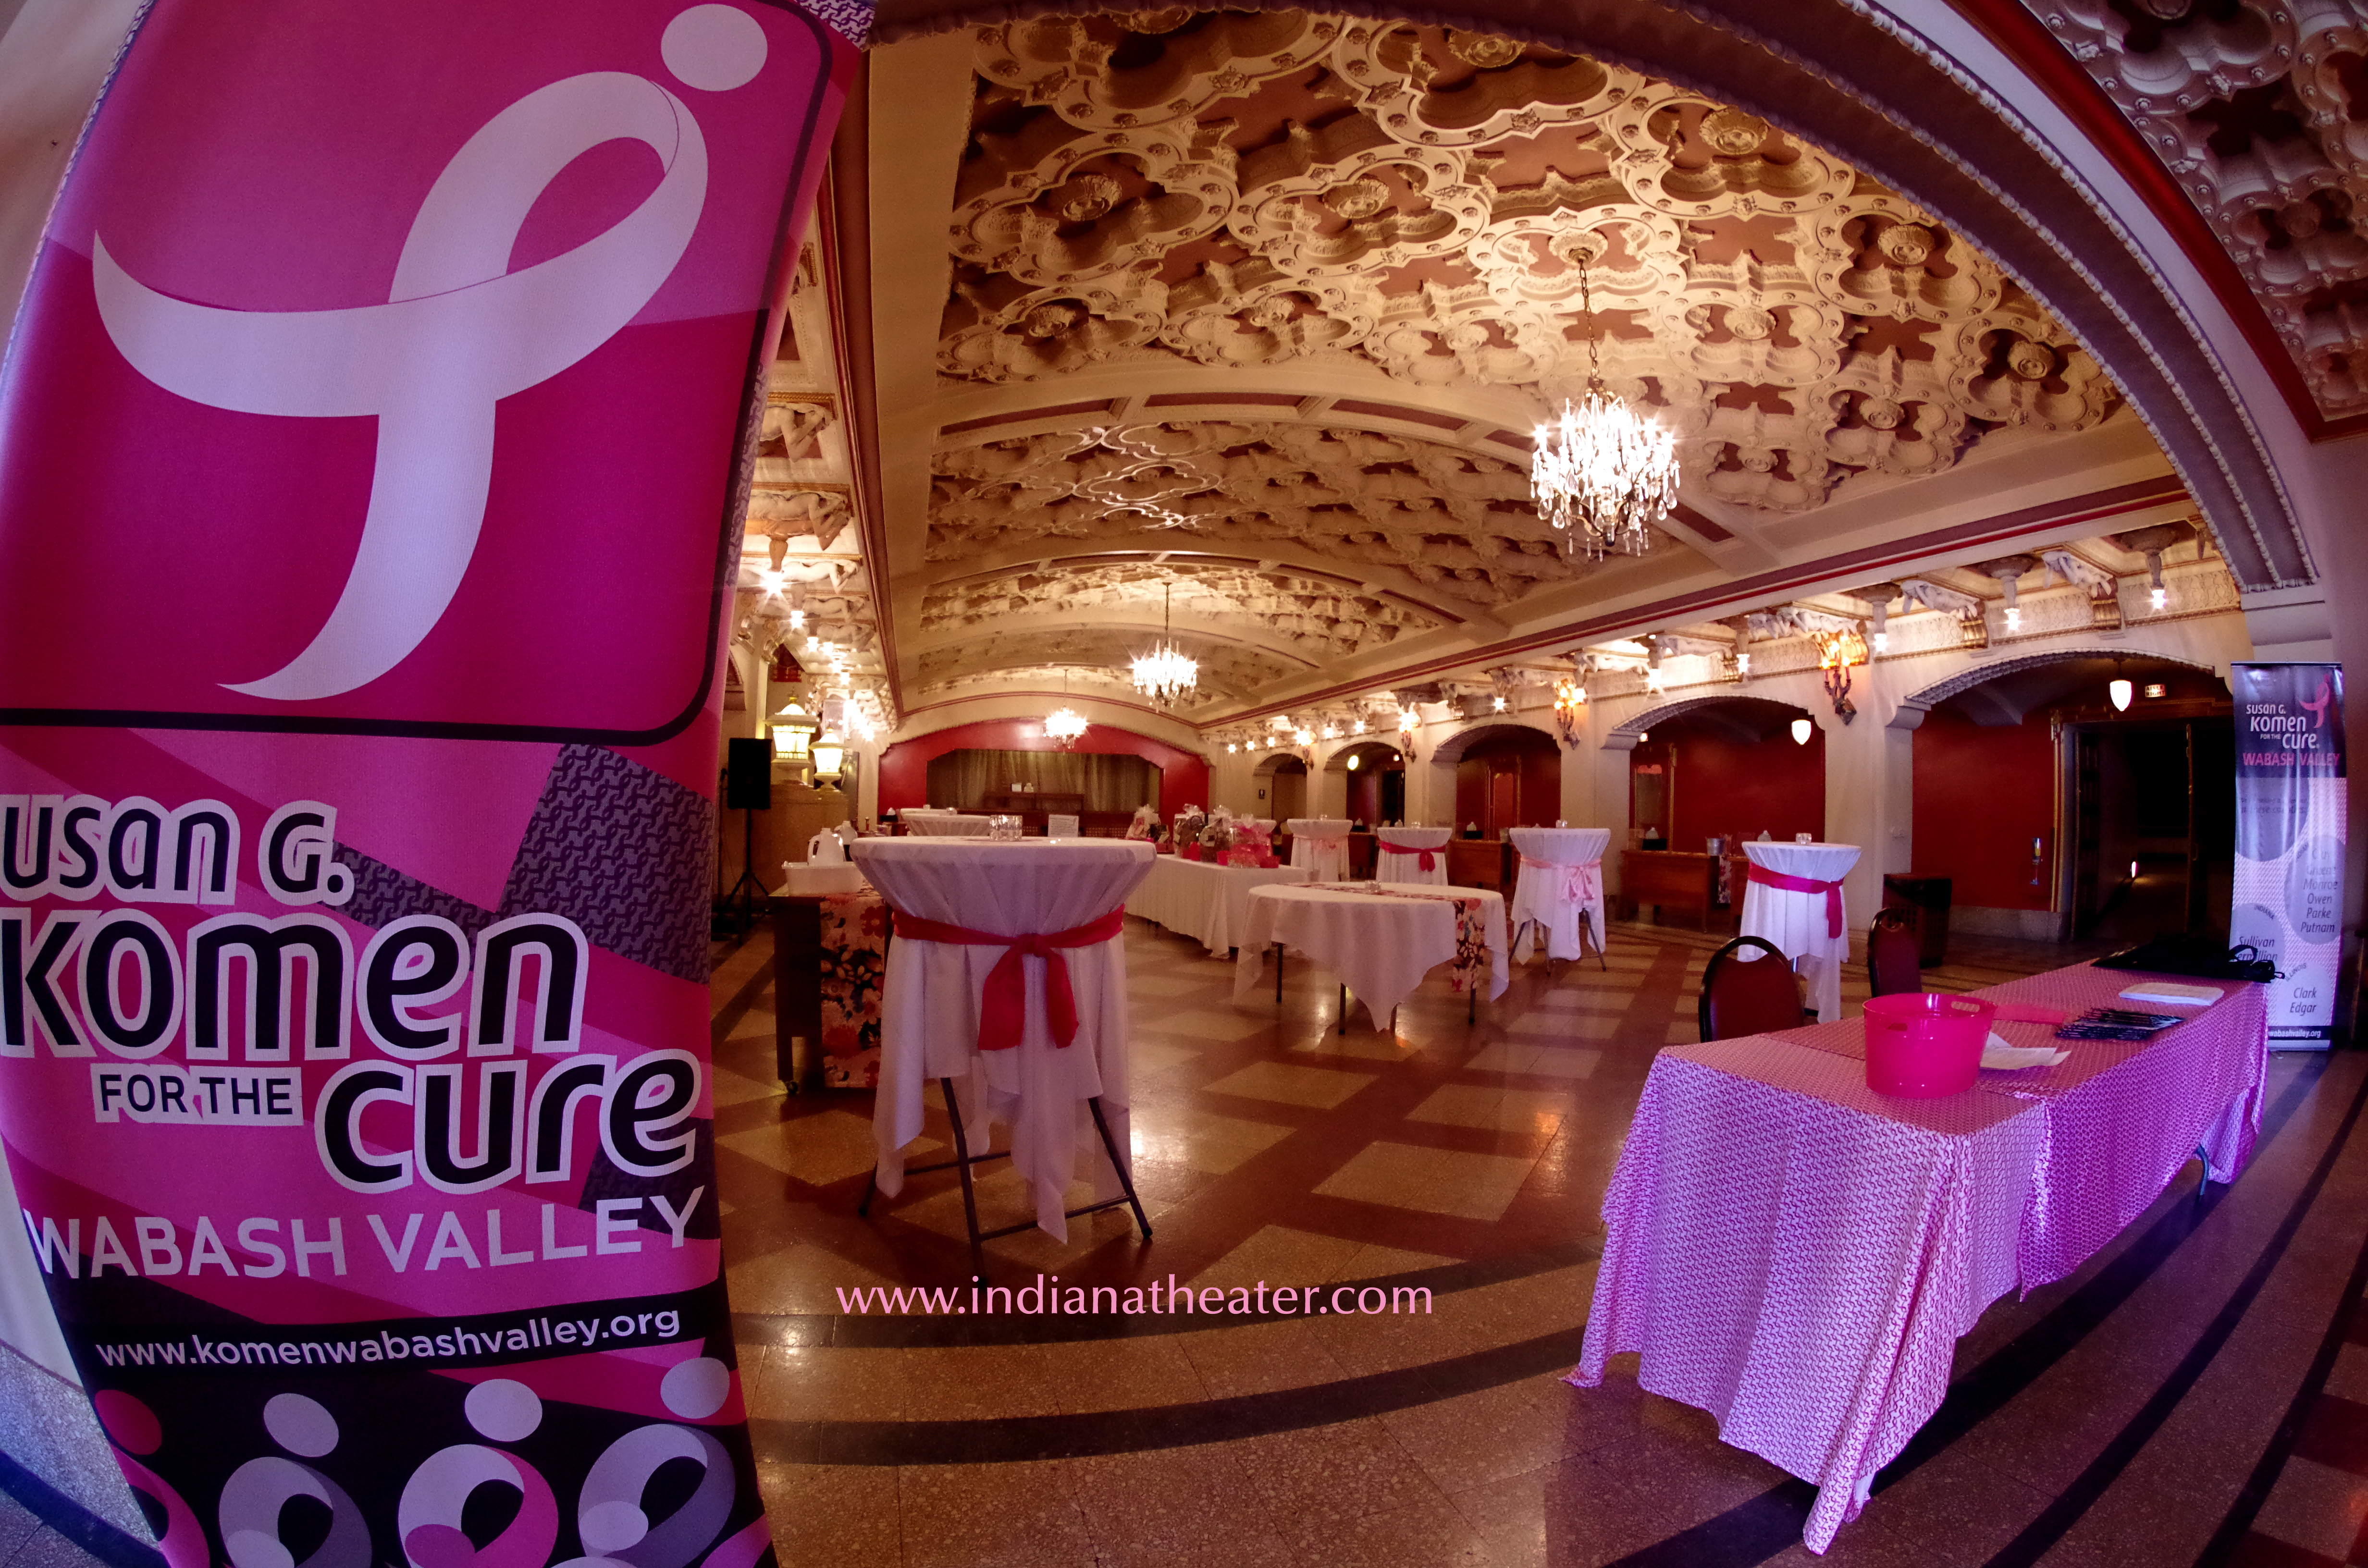 Susan Komen Indiana Theatre Lobby